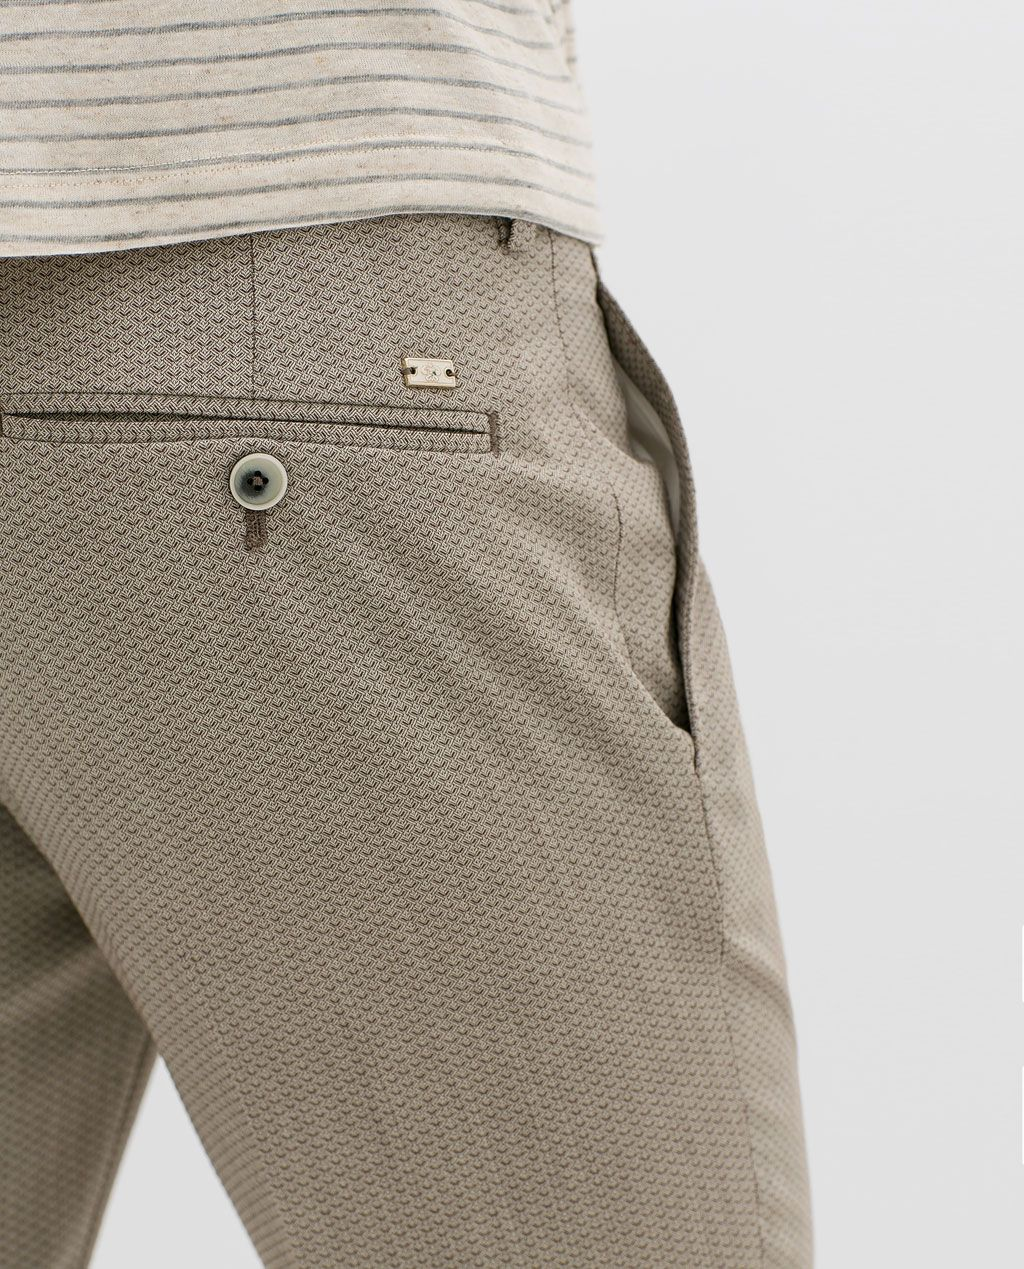 ZARA MAN STRUCTURED JACQUARD TROUSERS | Pantalones de